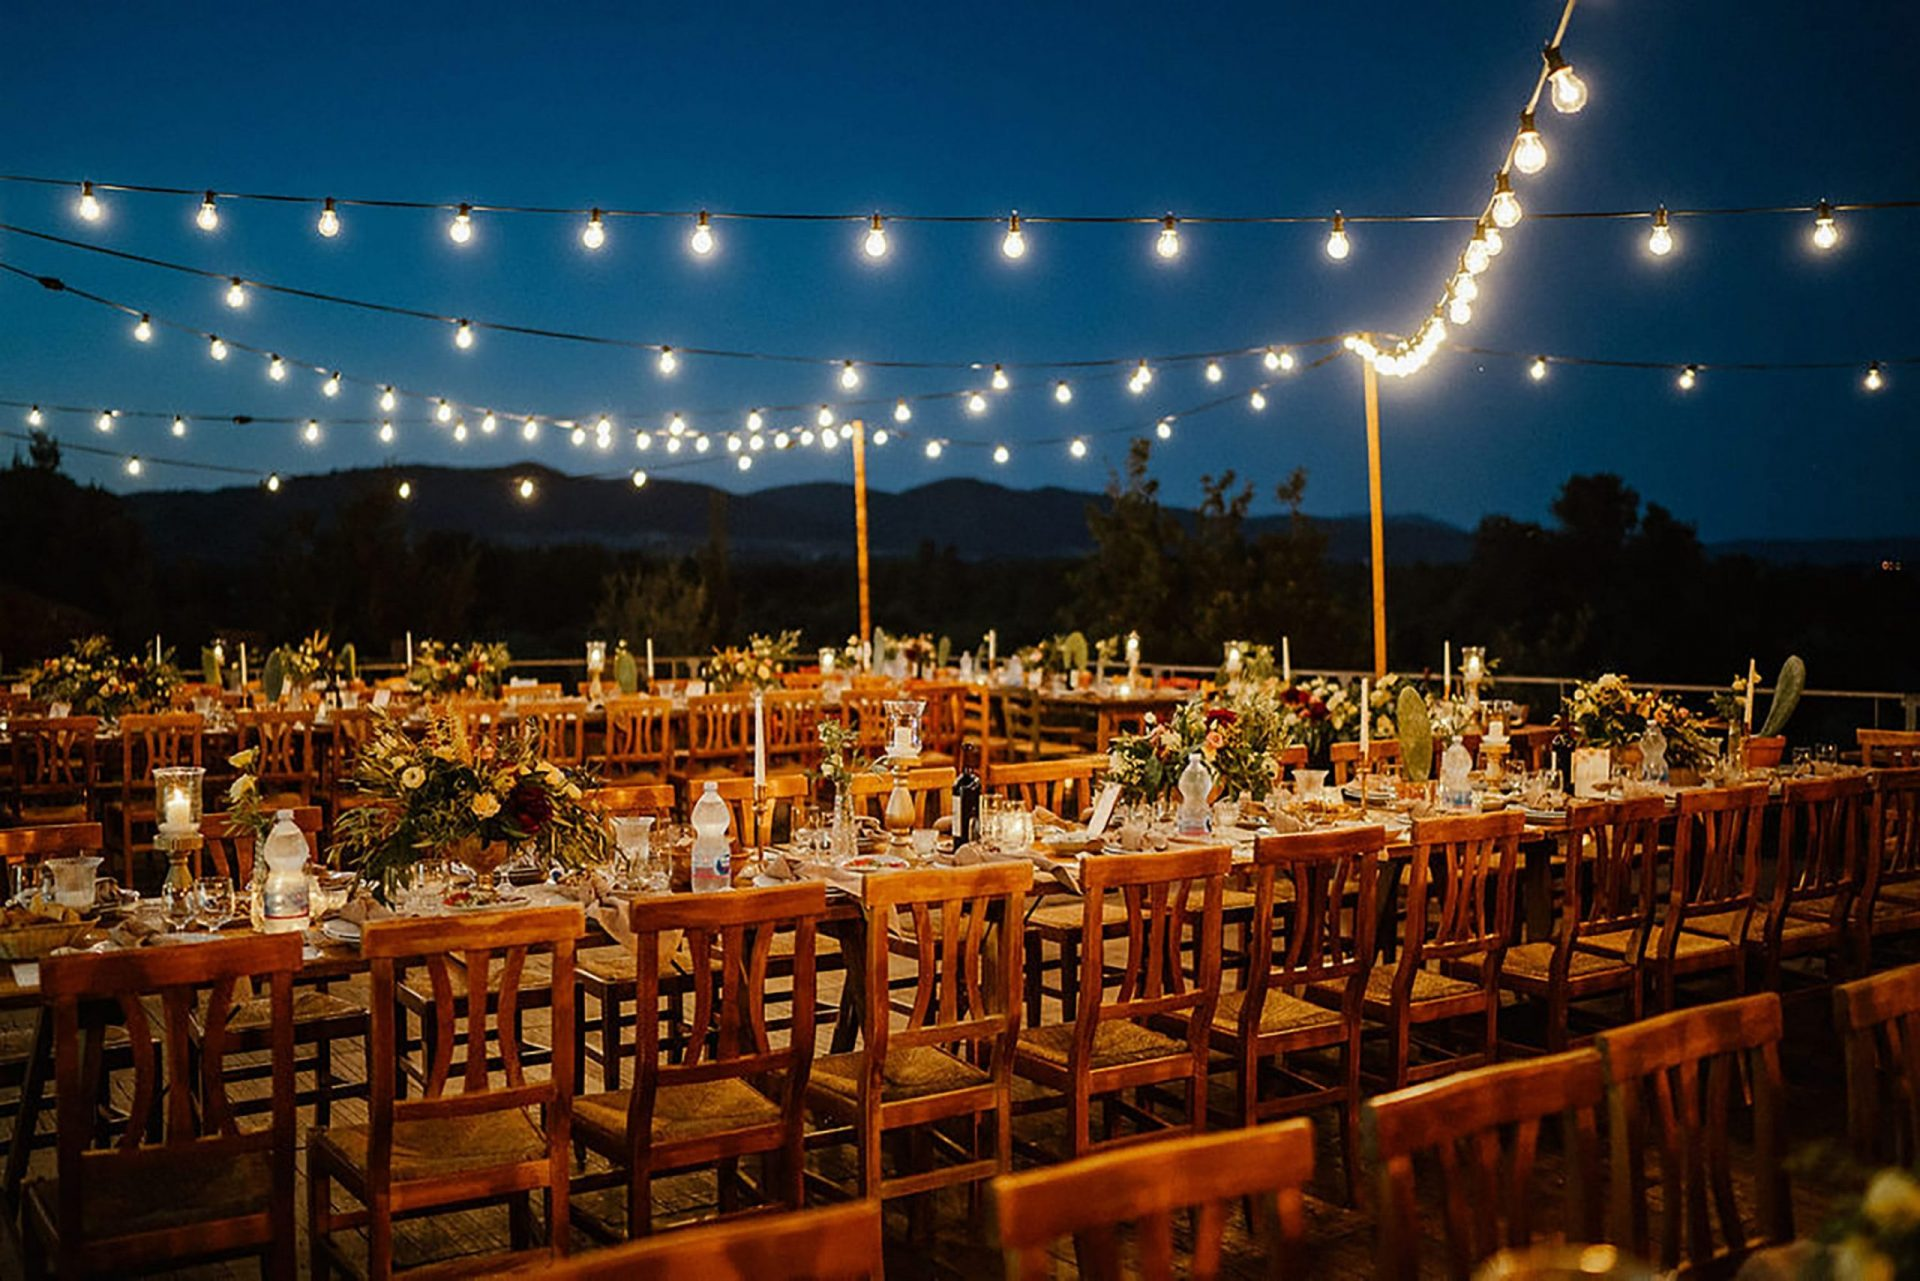 Marianna & Matteo, Sardinia country-style wedding reception